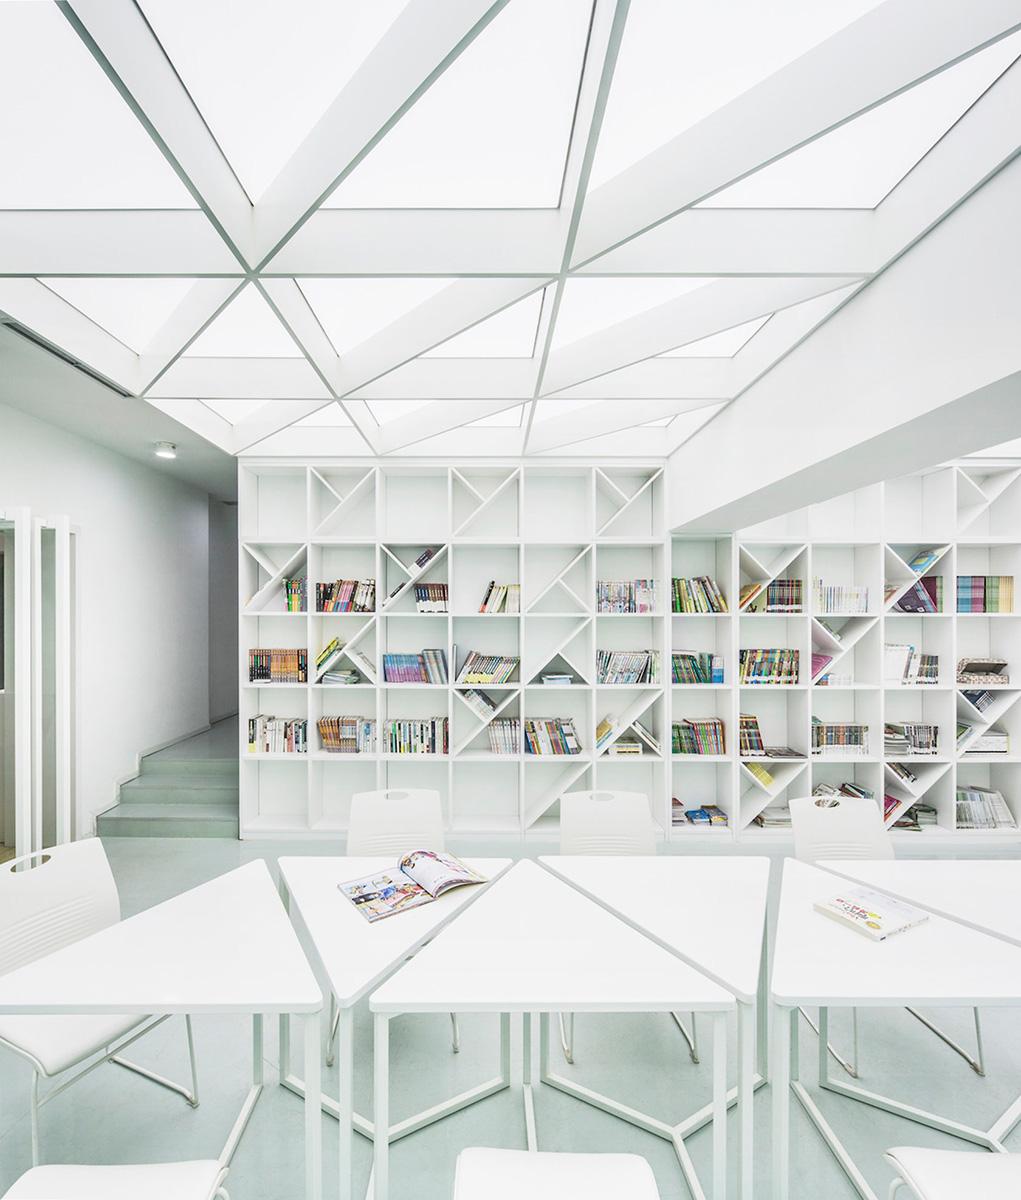 06-big-family-community-center-mat-office